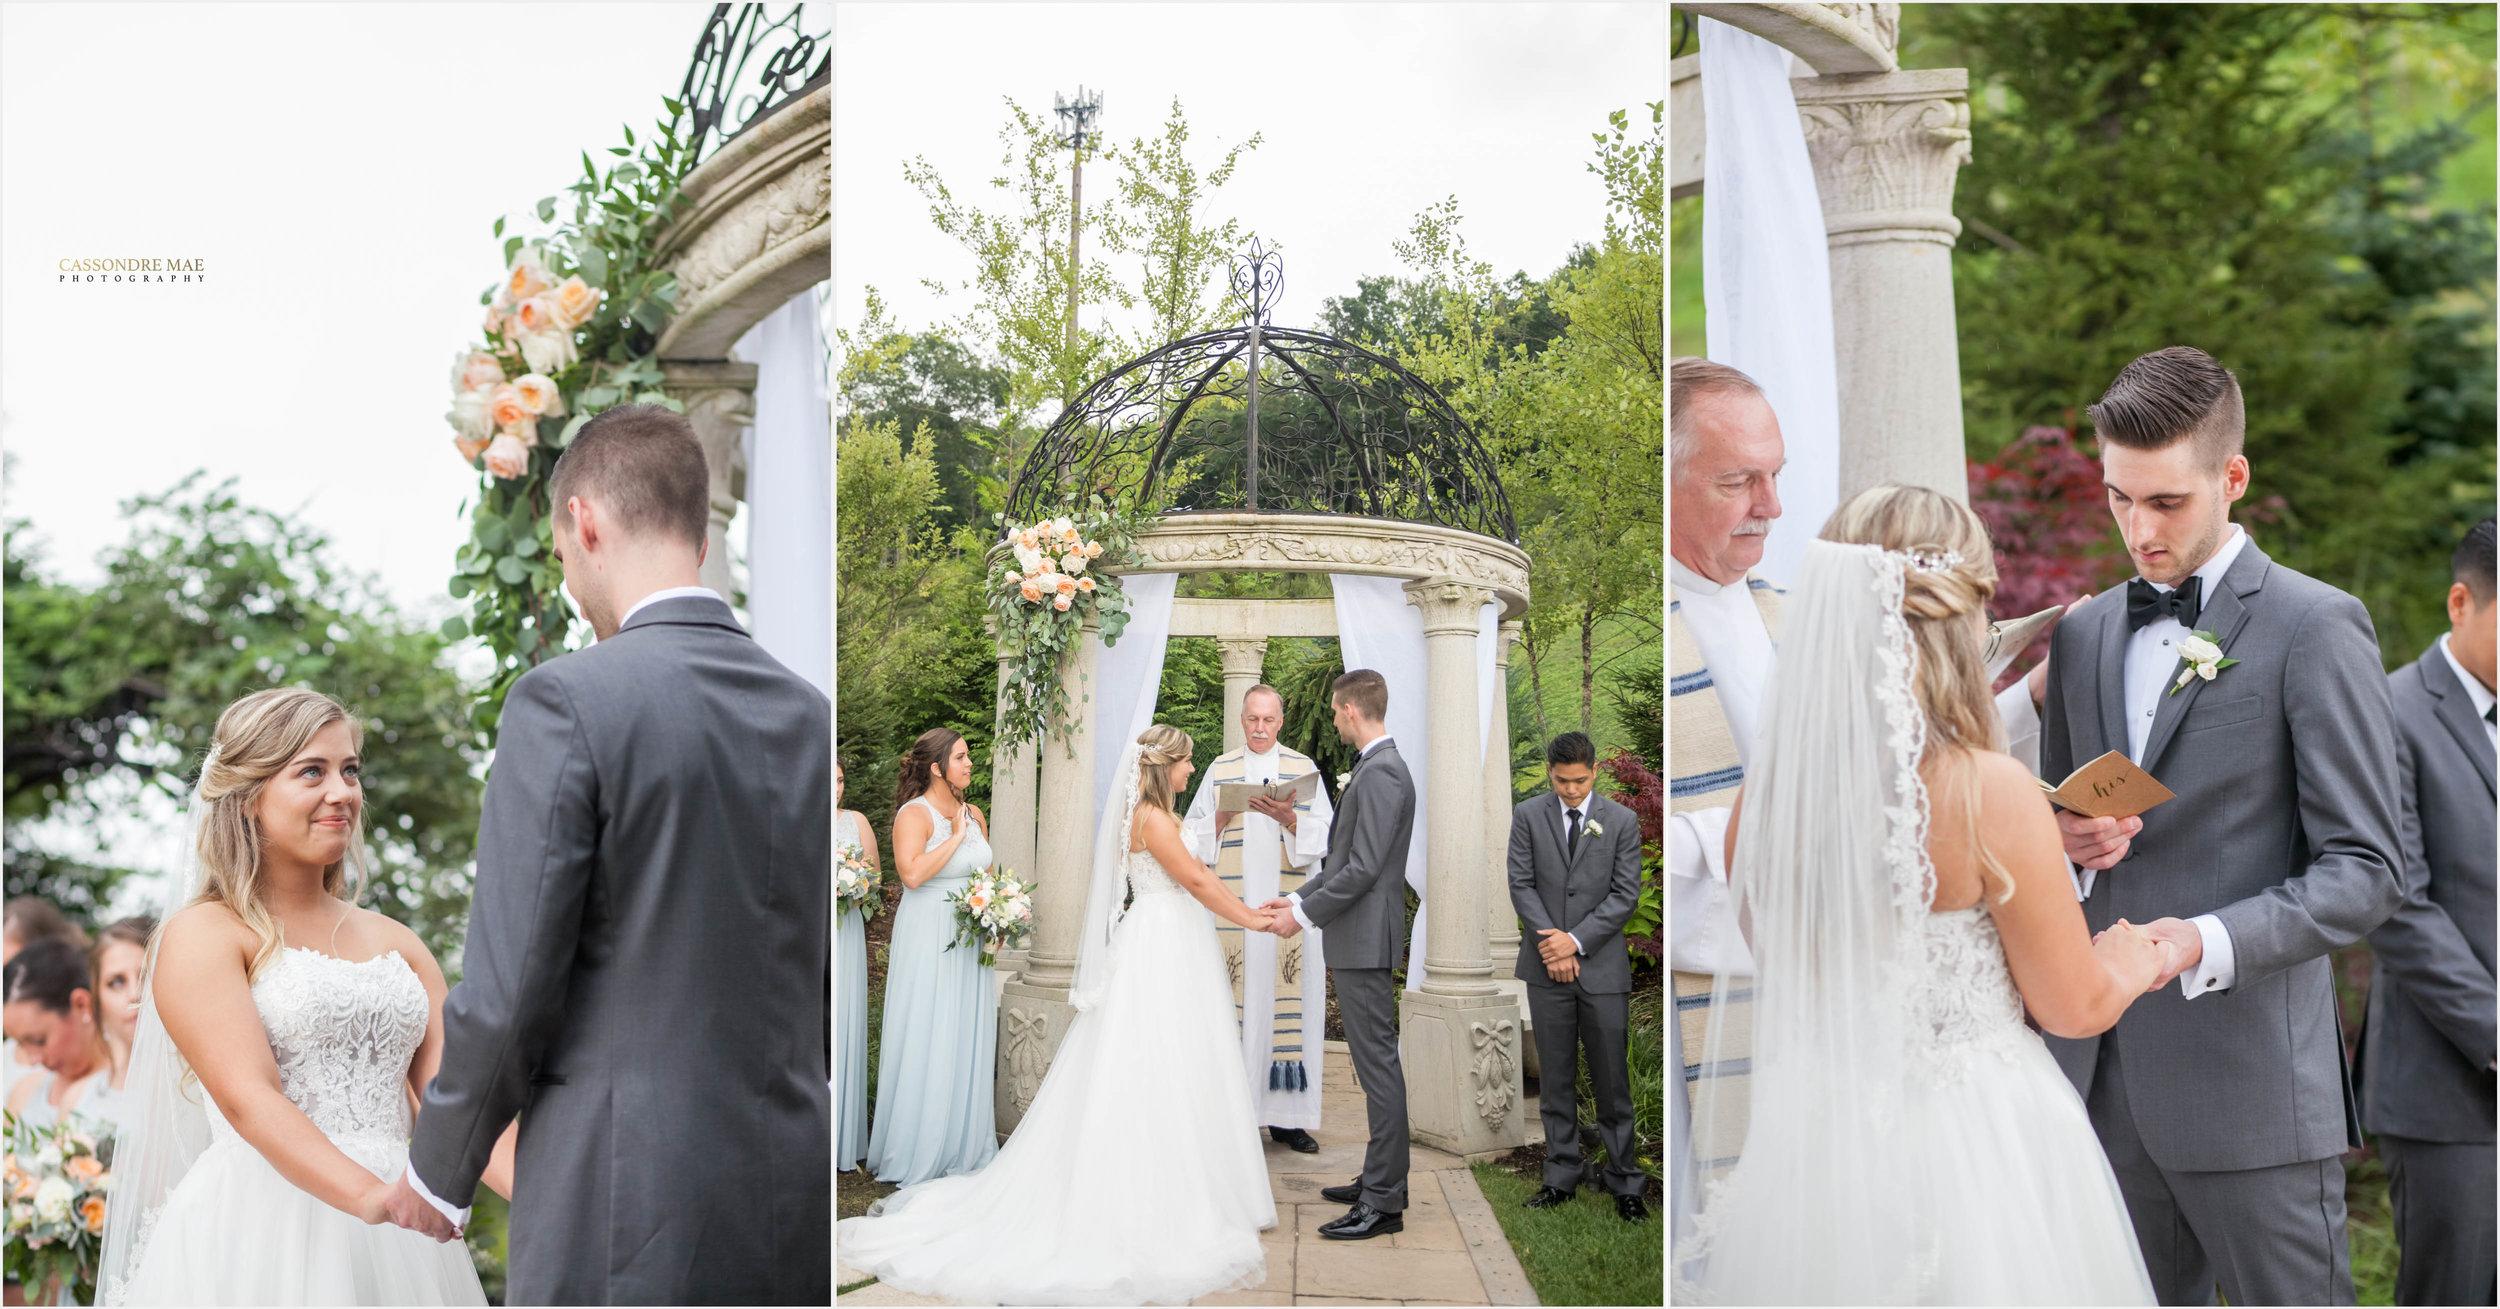 Cassondre Mae Photography Hudson Valley NY Wedding Photographer -23.jpg